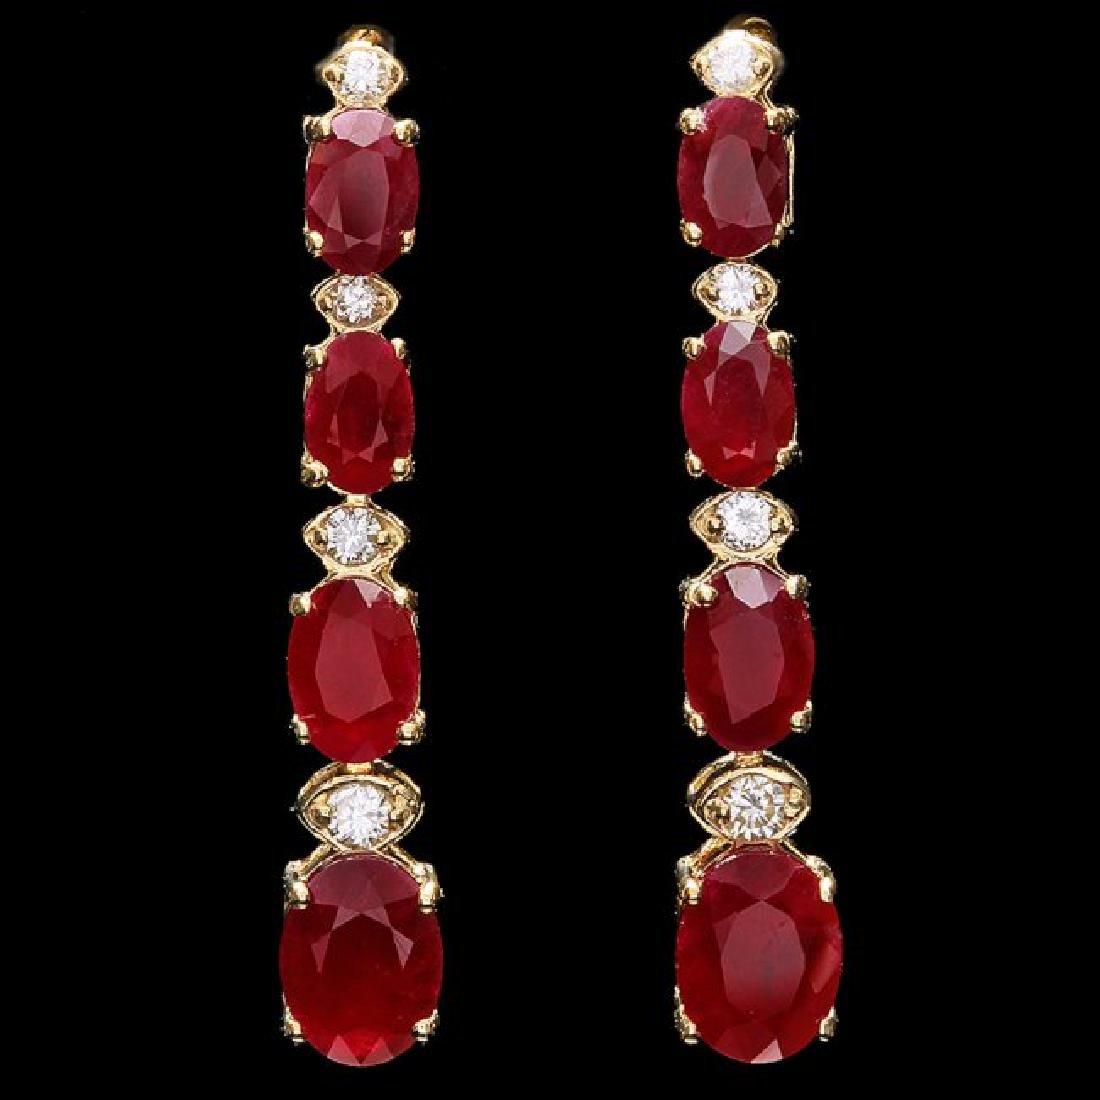 14k Gold 8.00ct Ruby 0.30ct Diamond Earrings